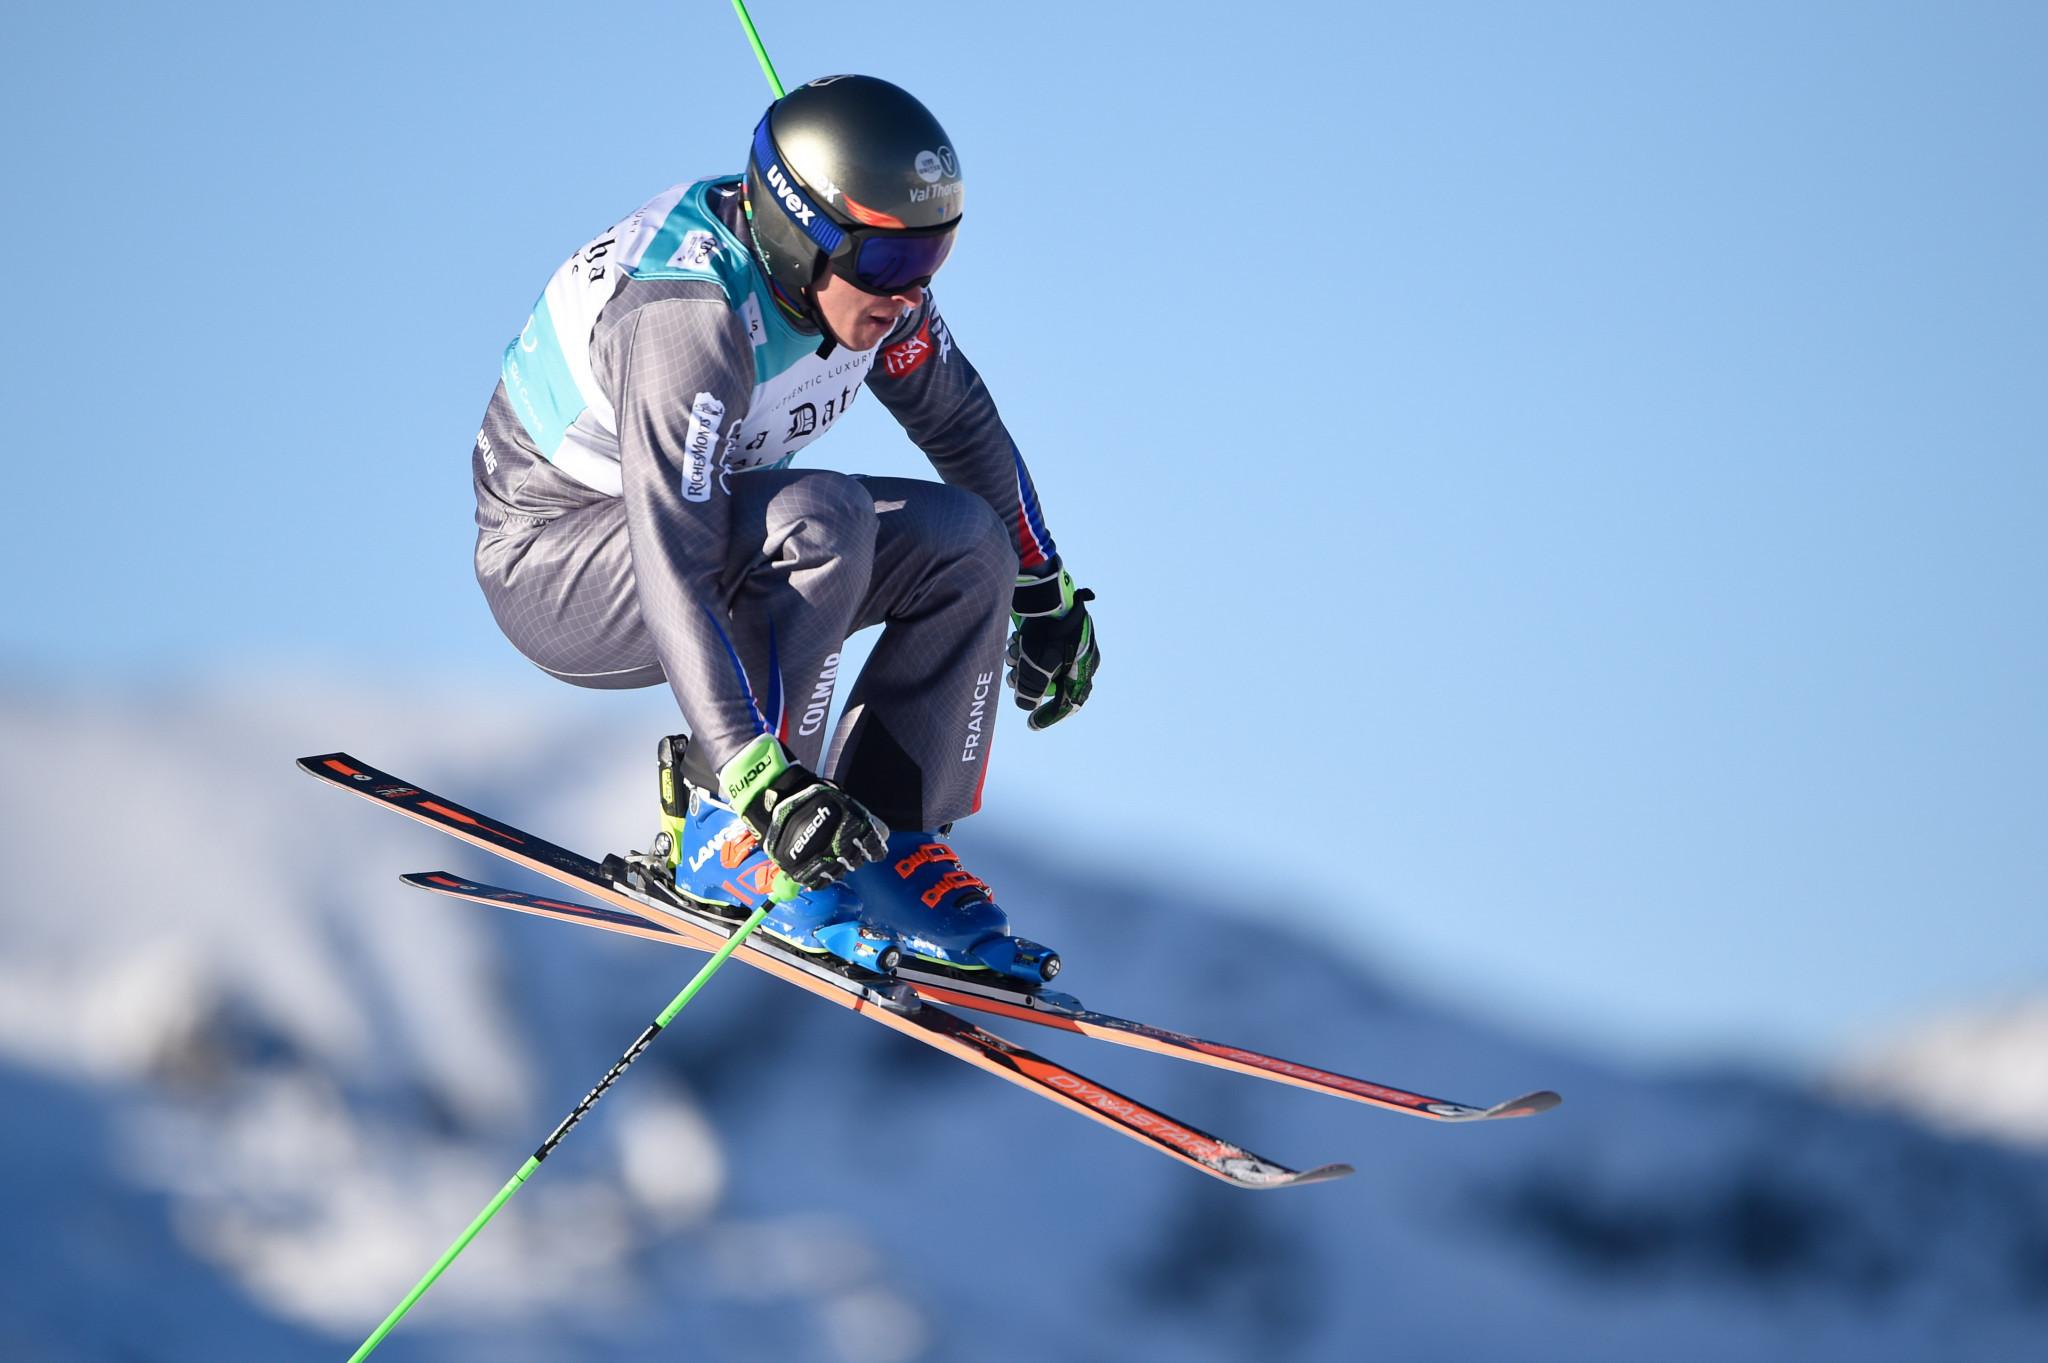 FIS Freestyle Ski World Cup set to resume in Montafon